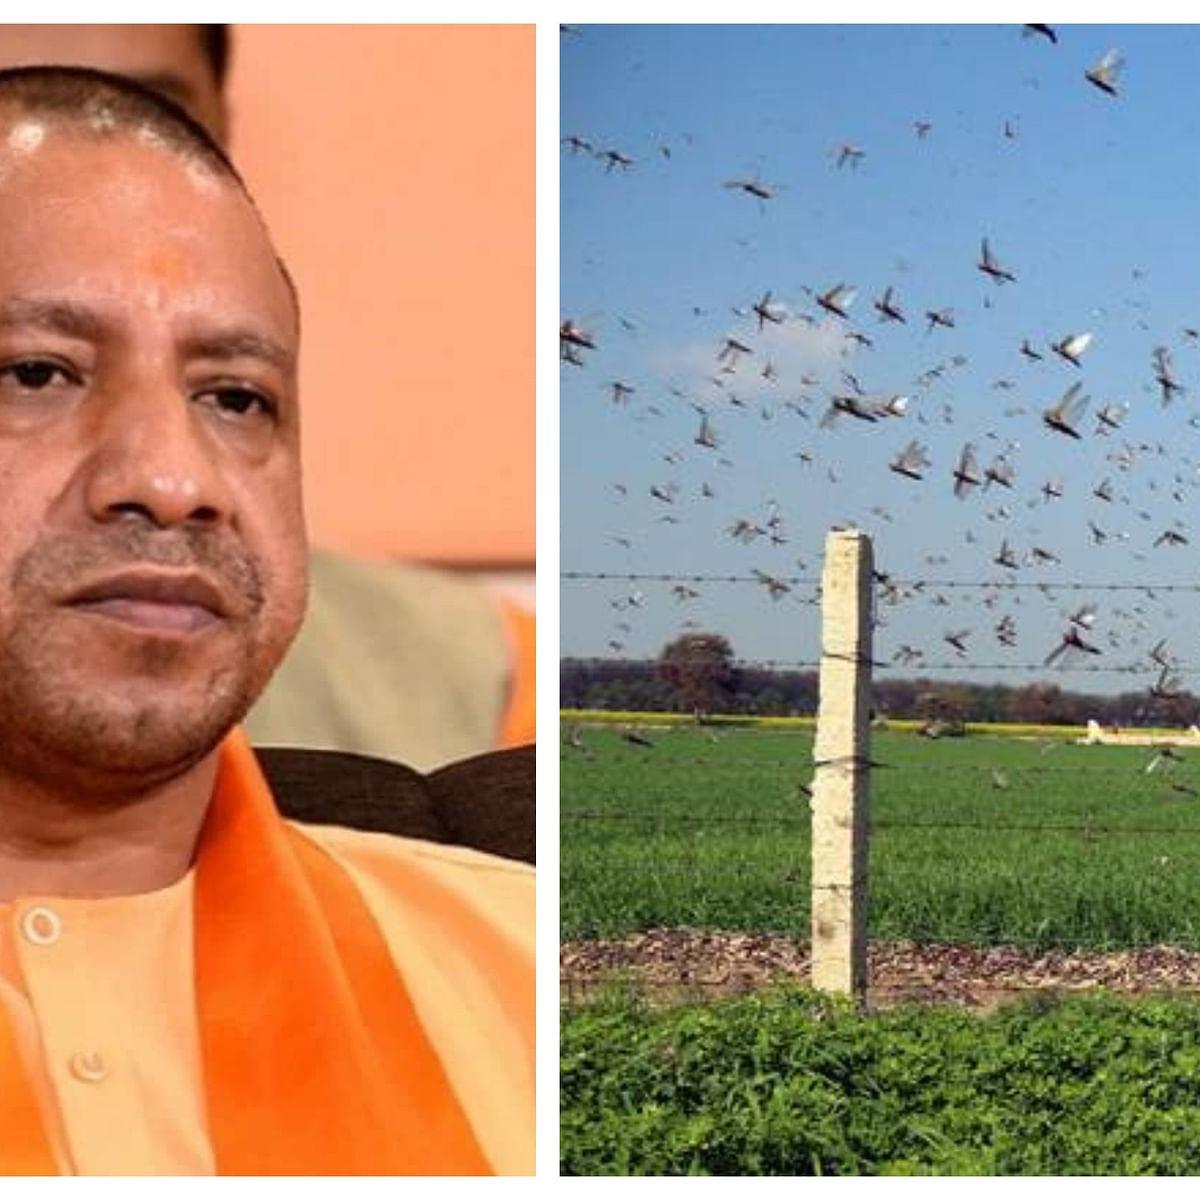 Now, UP CM Yogi Adityanath says beat 'thalis' to drive away locusts